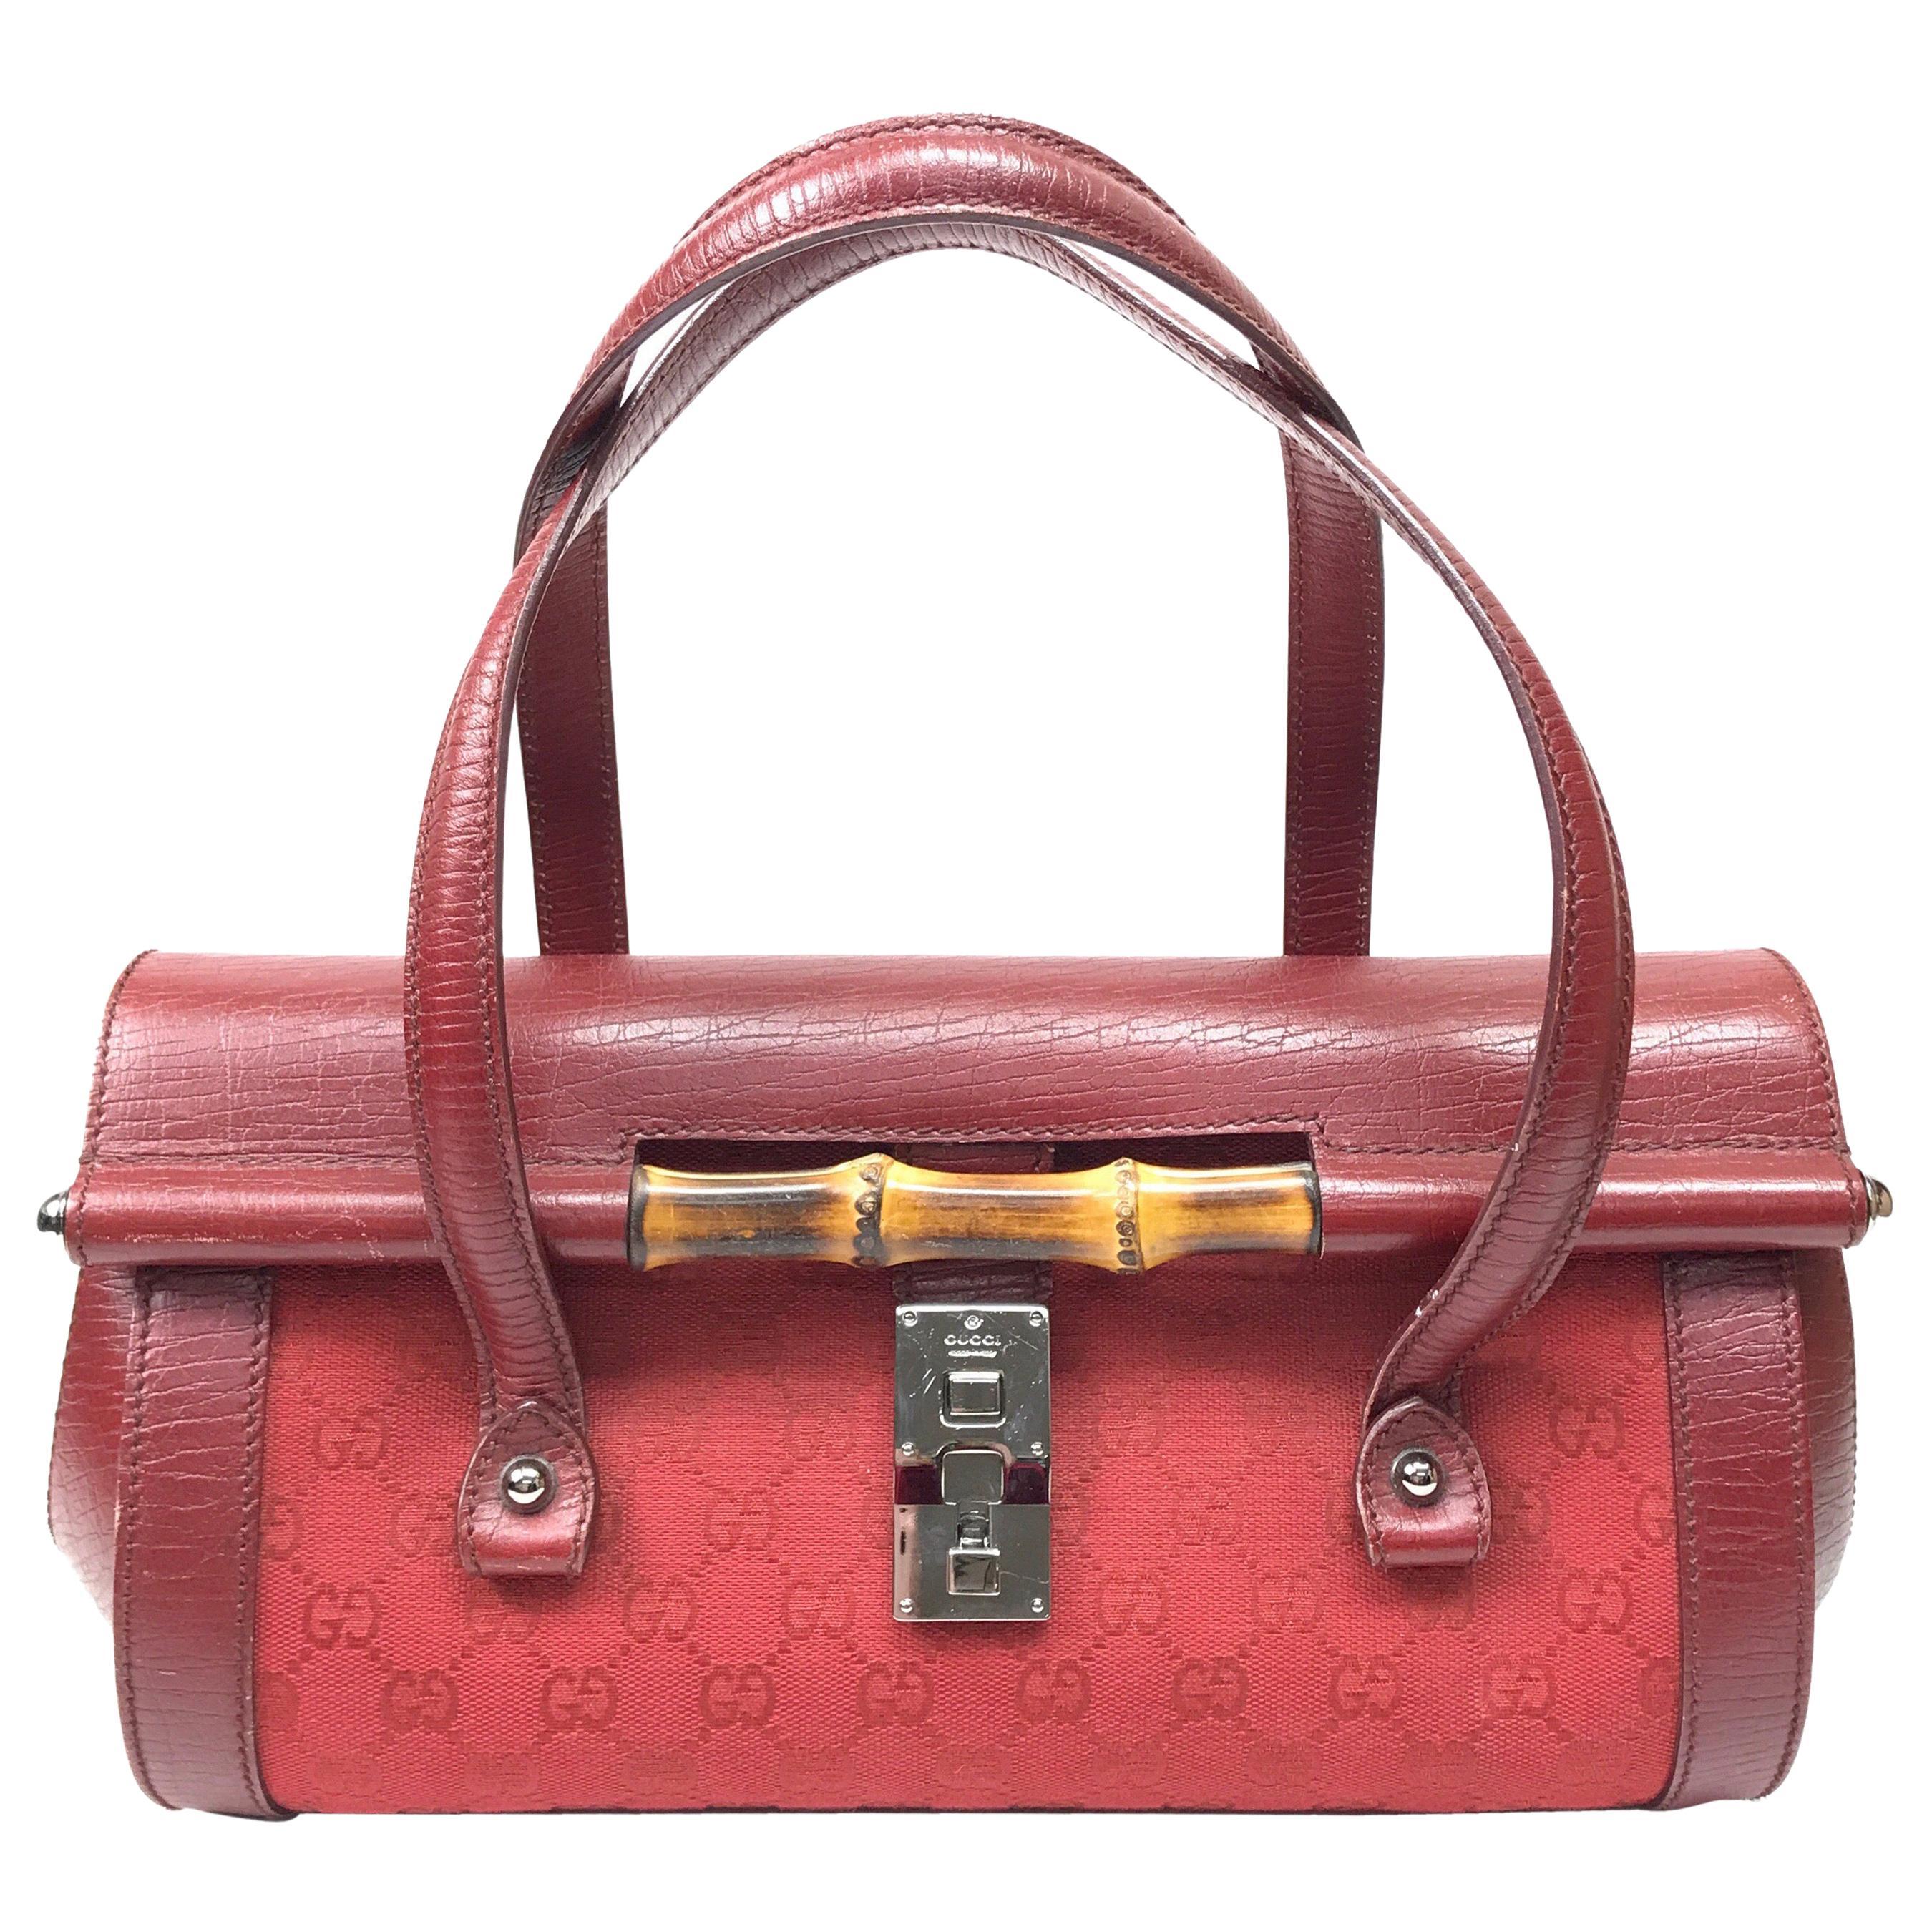 Gucci Red Monogram Leather Bamboo Bullet Handbag